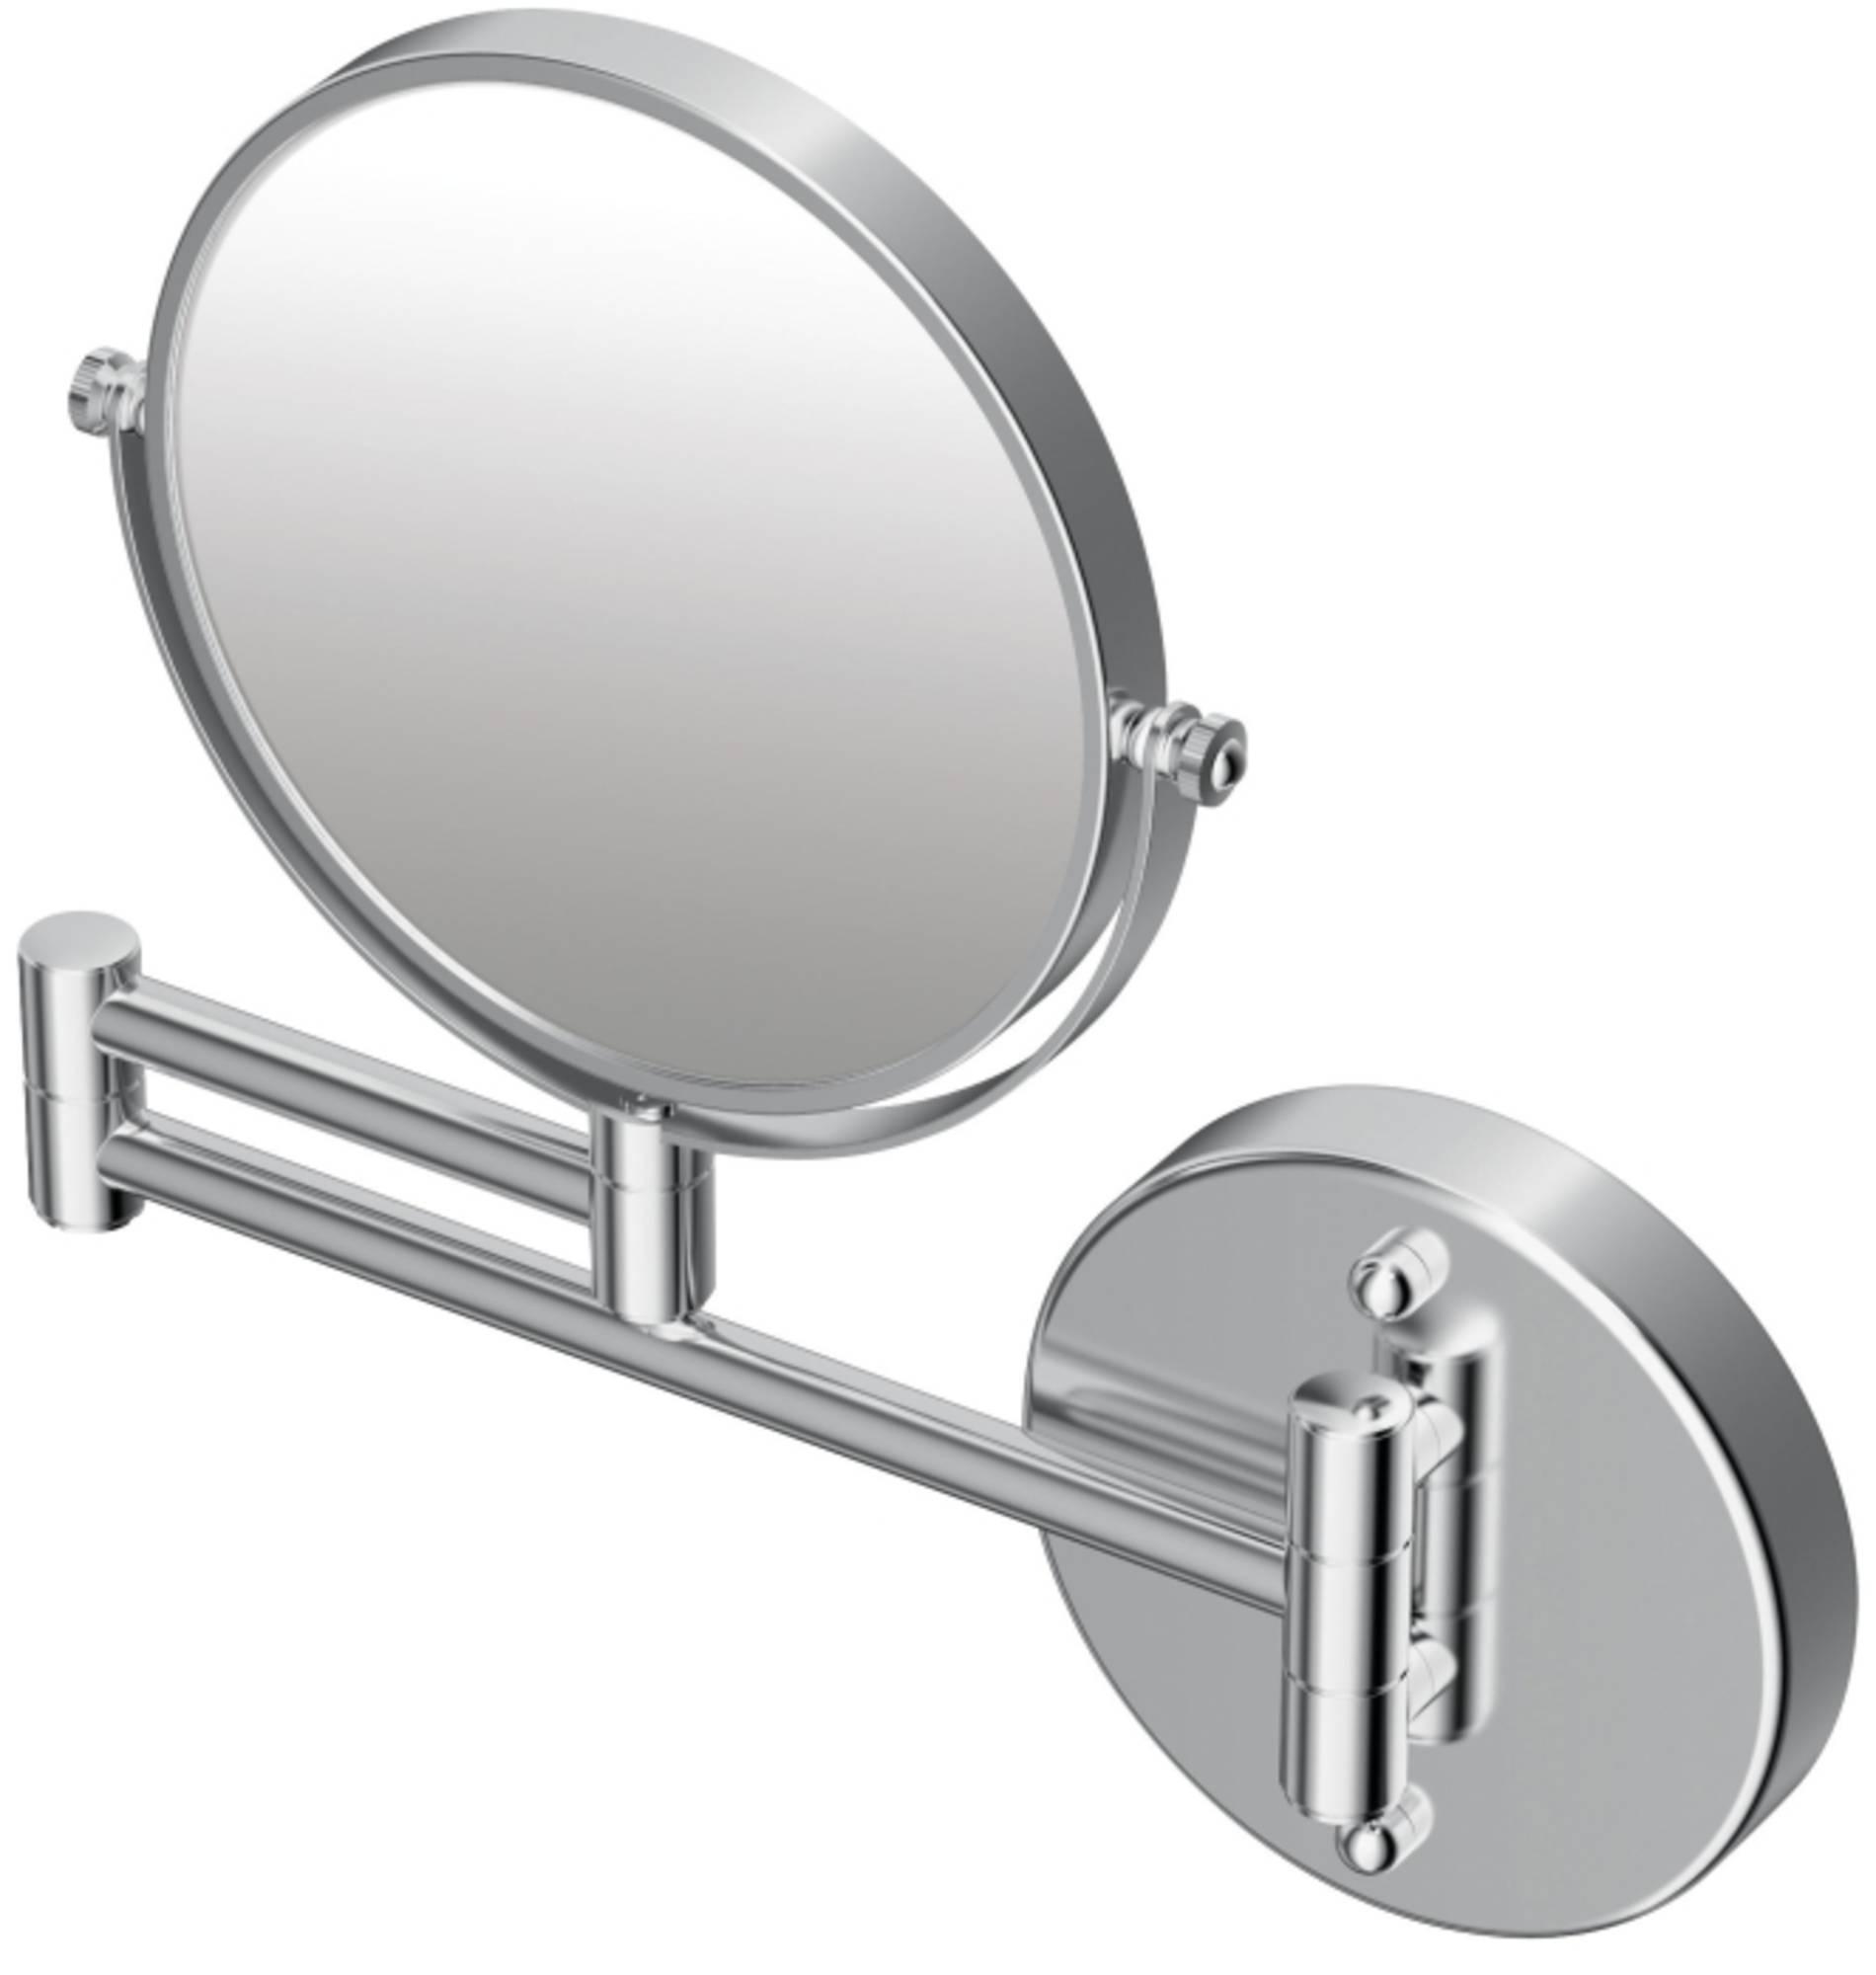 Ideal standard Iom cosmeticaspiegel rond 15.3 cm, met scharnierarm, chroom